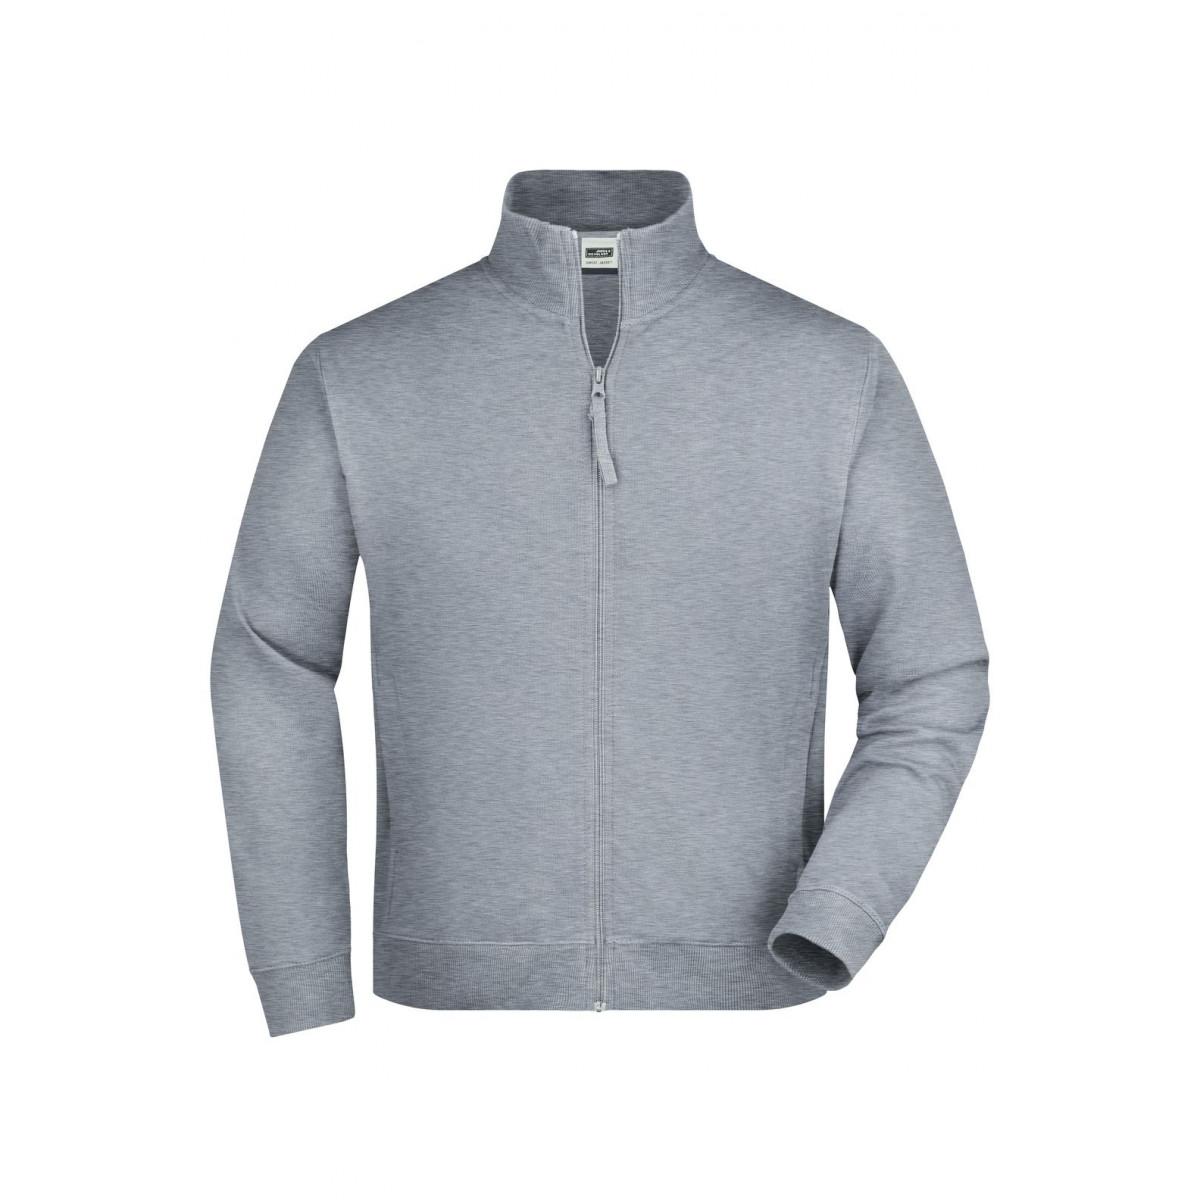 Толстовка мужская JN058 Sweat Jacket - Серый меланж